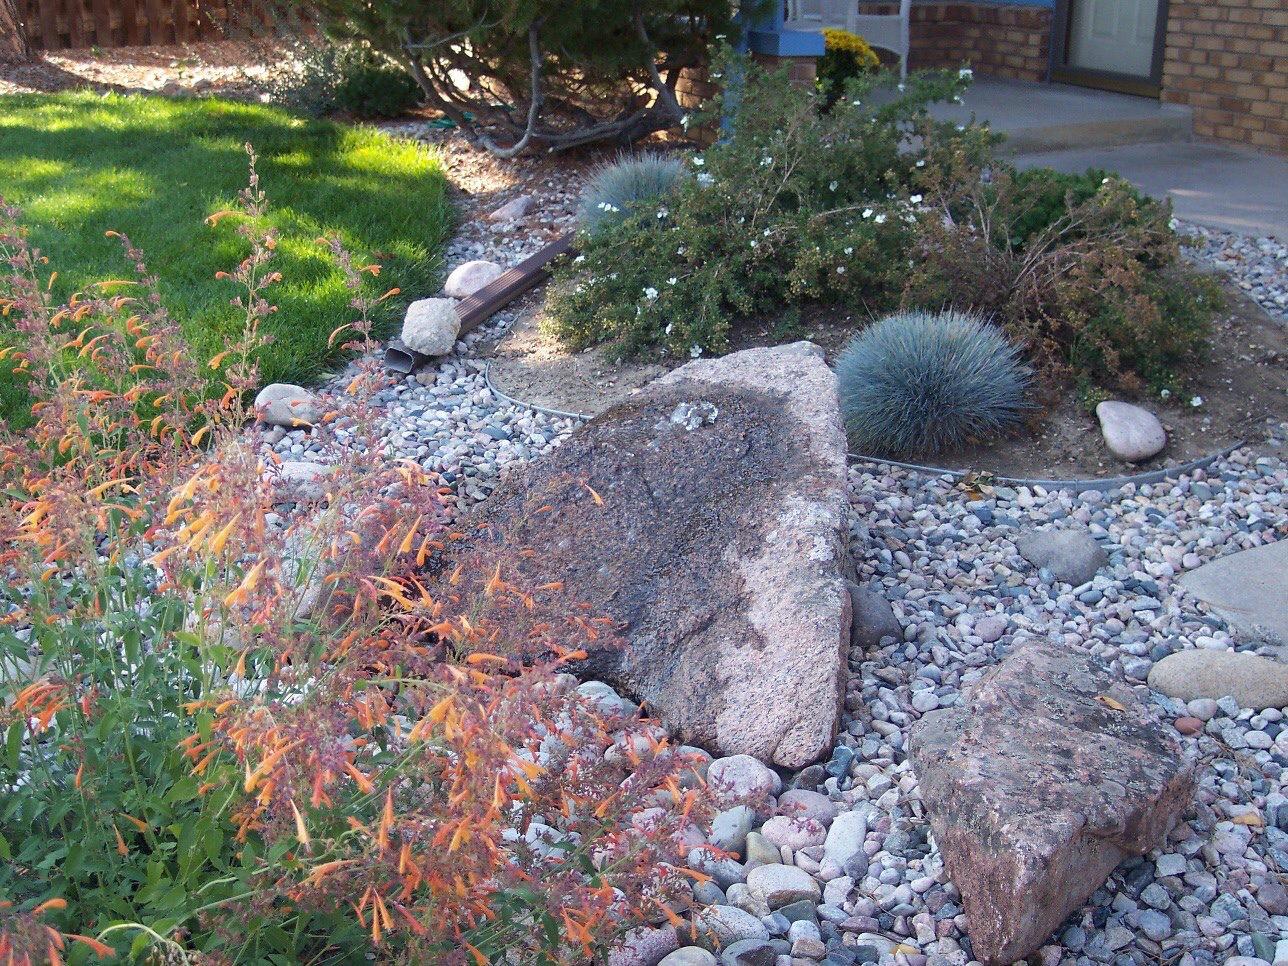 Pond-less bubbling rock feature.